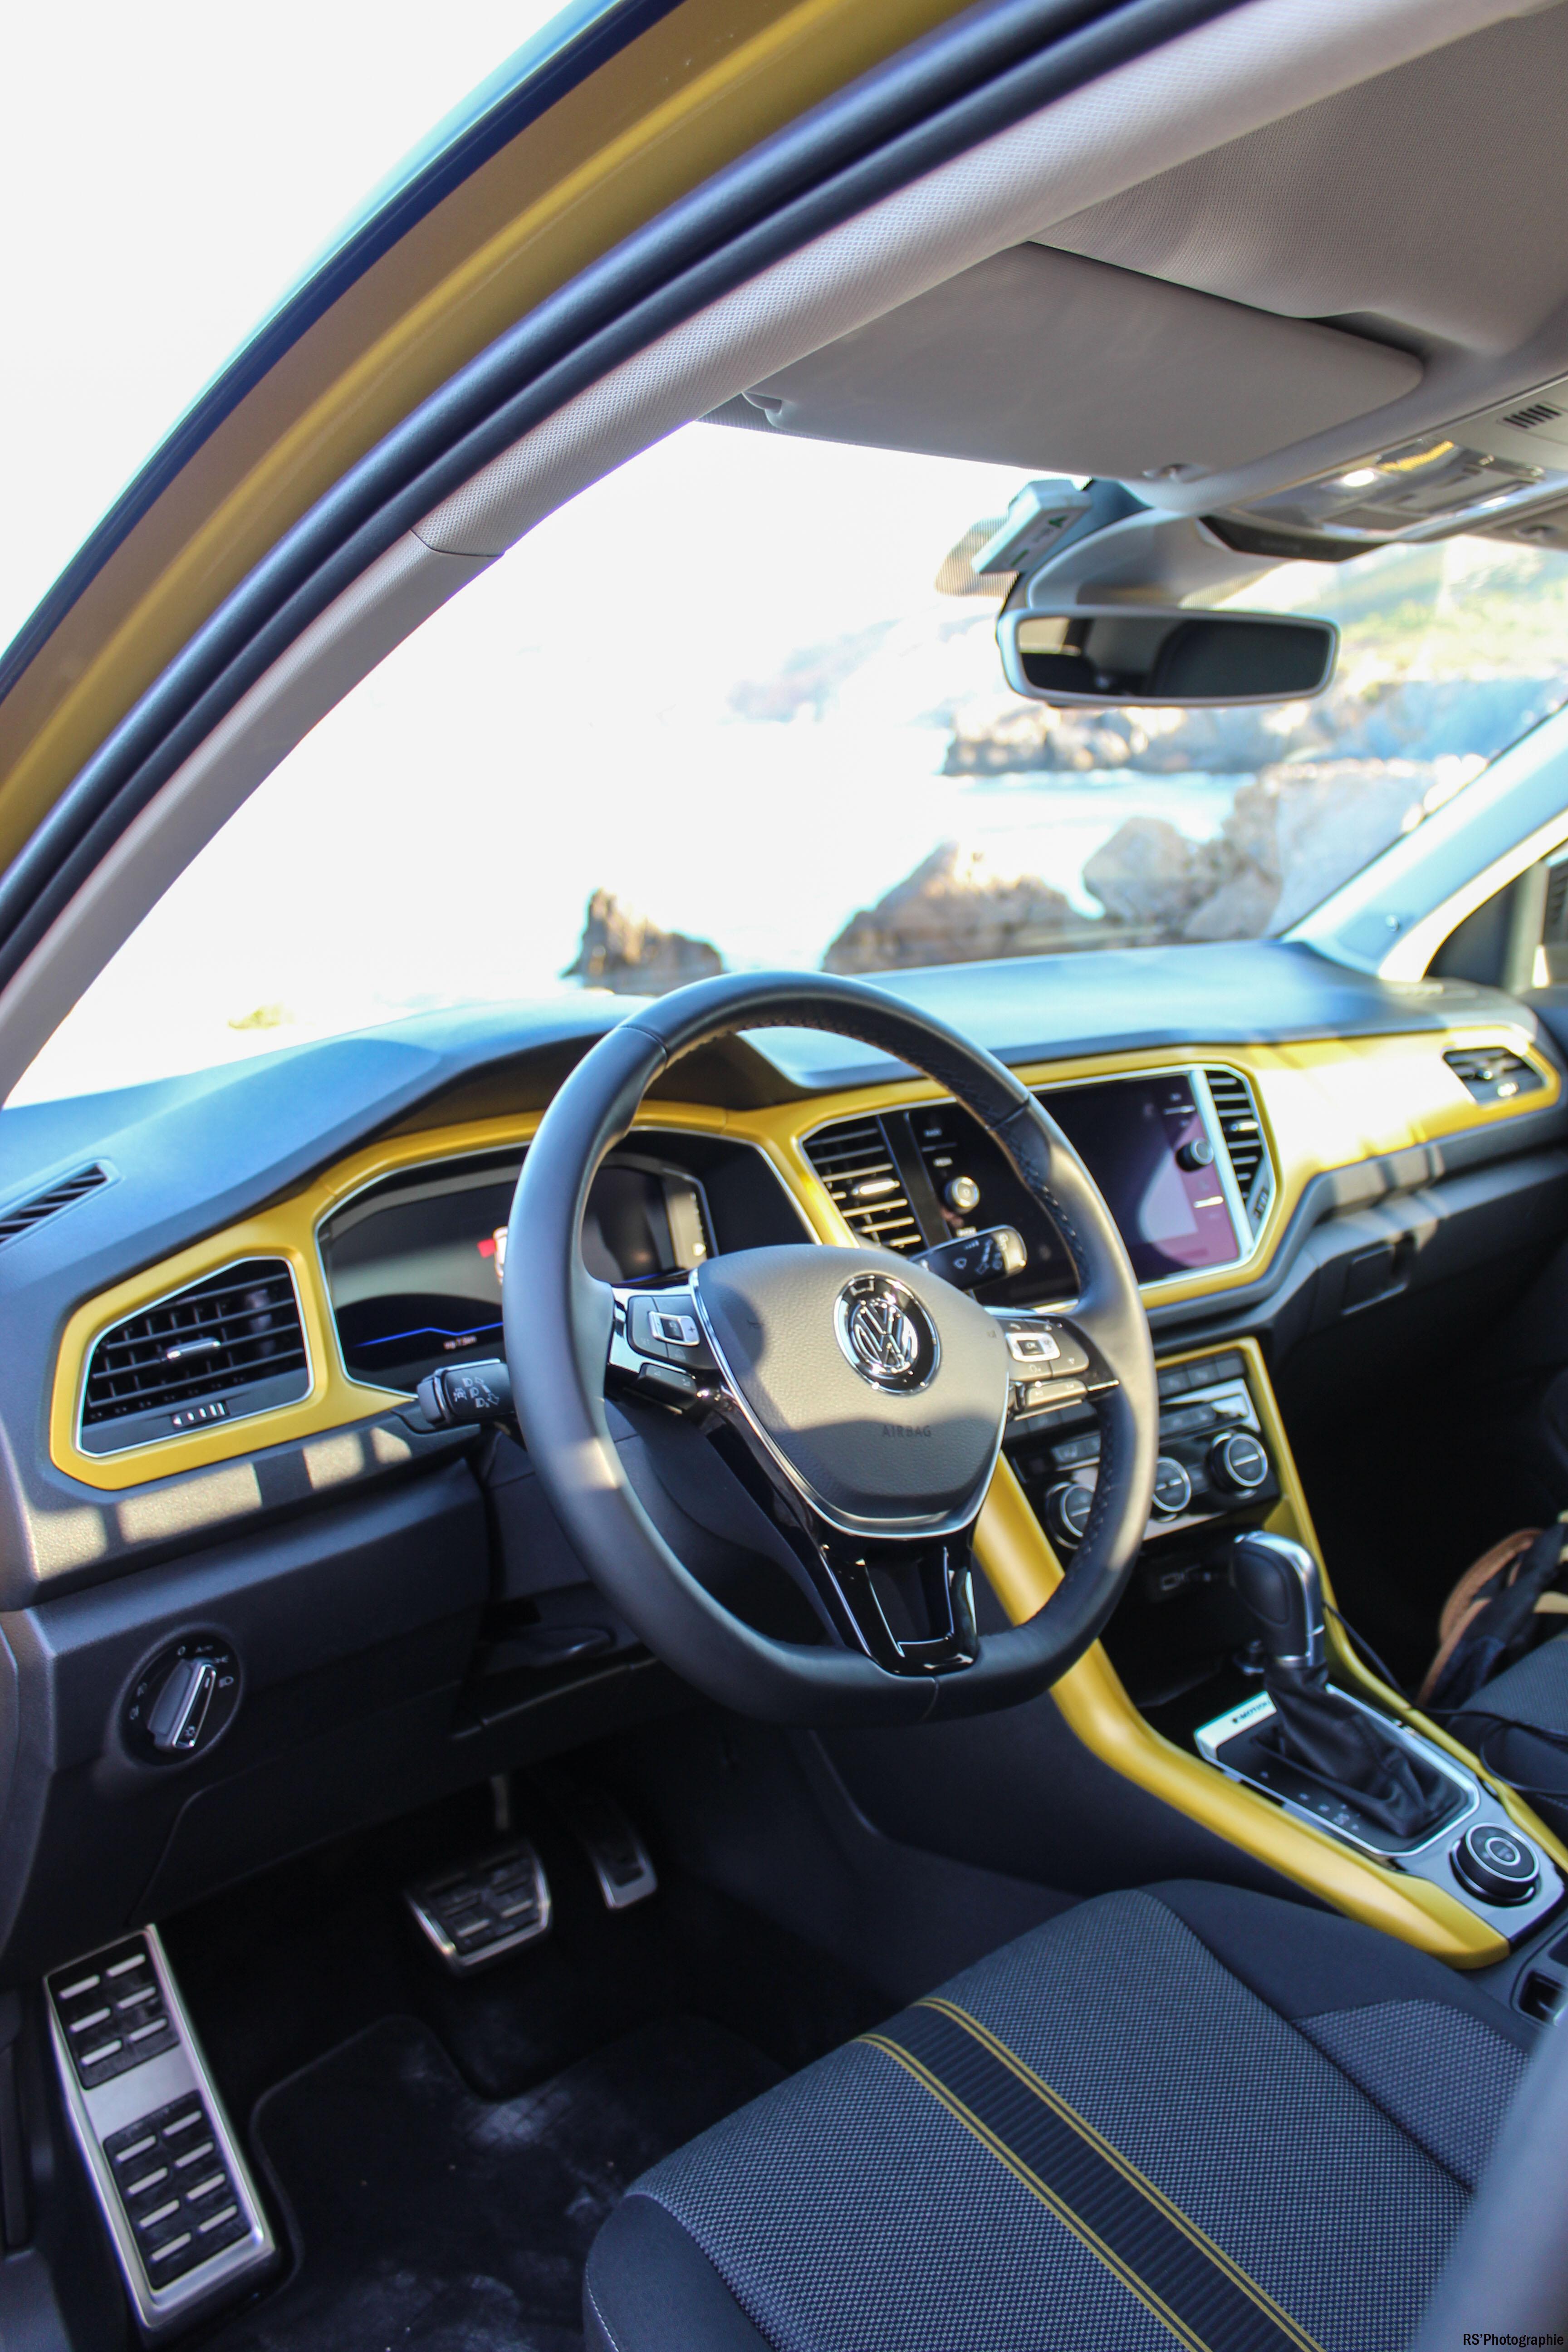 Volkswagentroc102-vw-t-roc-intérieur-onboard-Arnaud Demasier-RSPhotographie